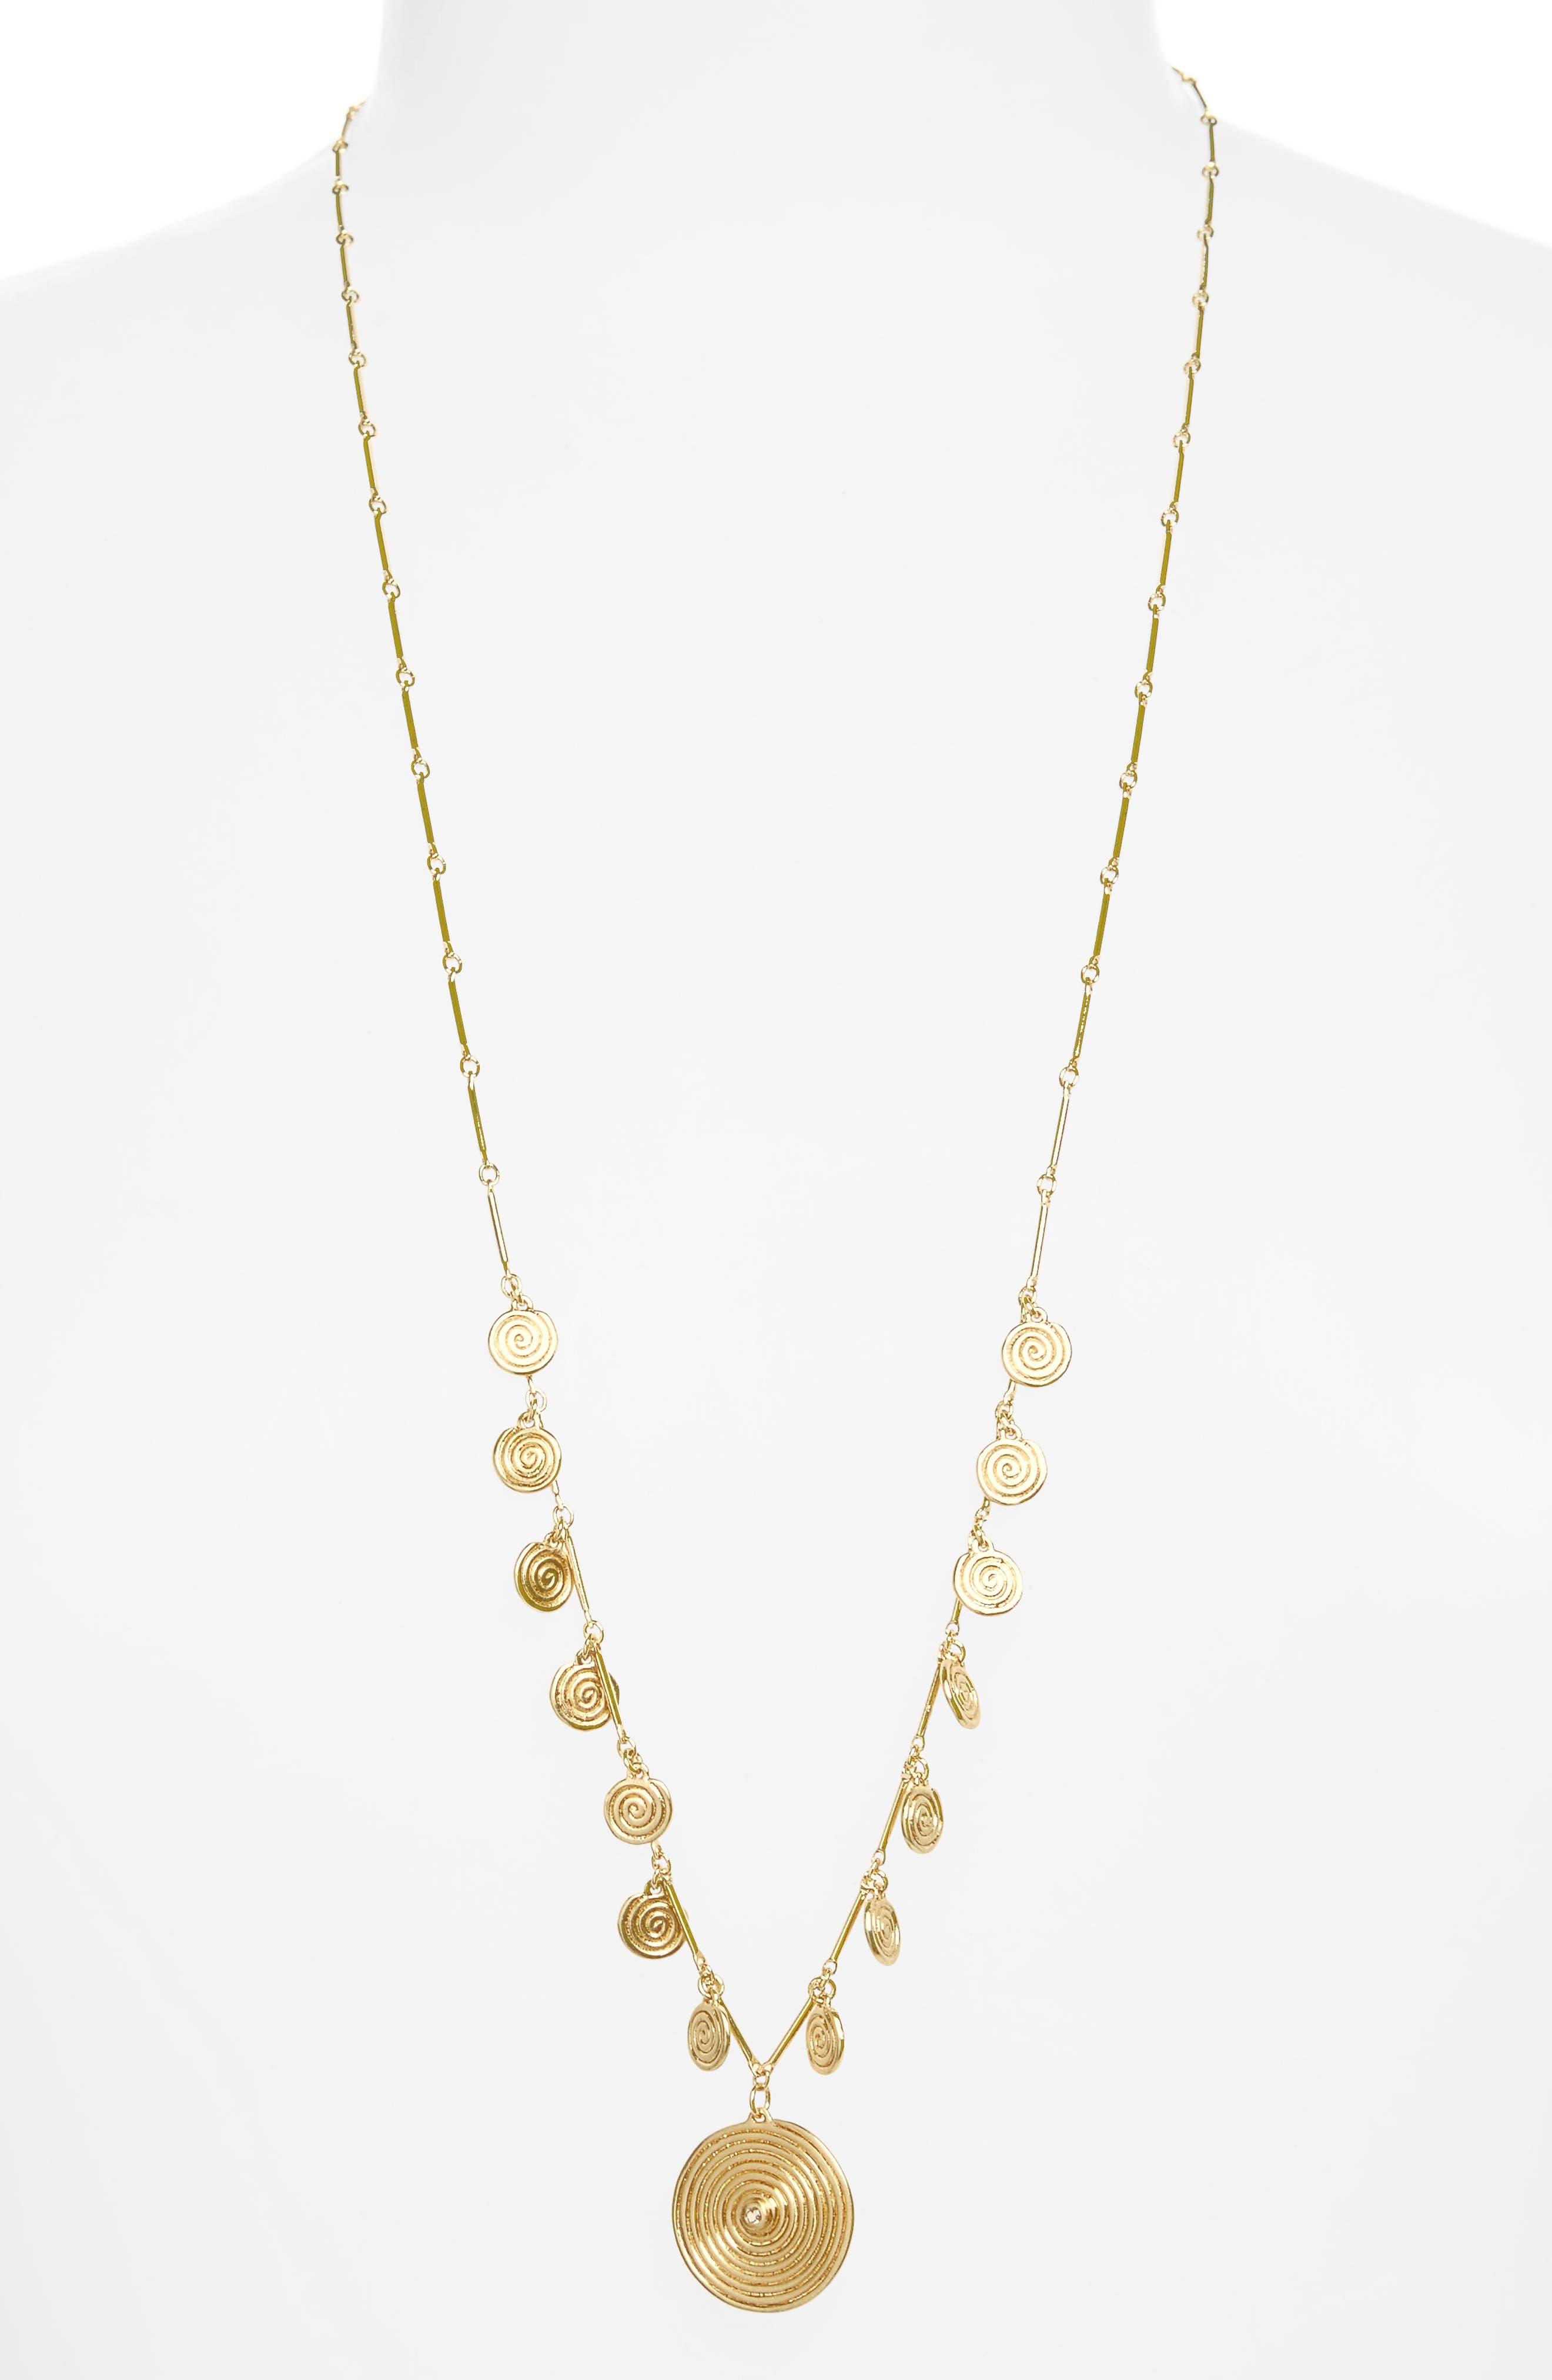 Sullivan - Ashlyn White Topaz Pendant Necklace,                             Main thumbnail 1, color,                             Yellow Gold